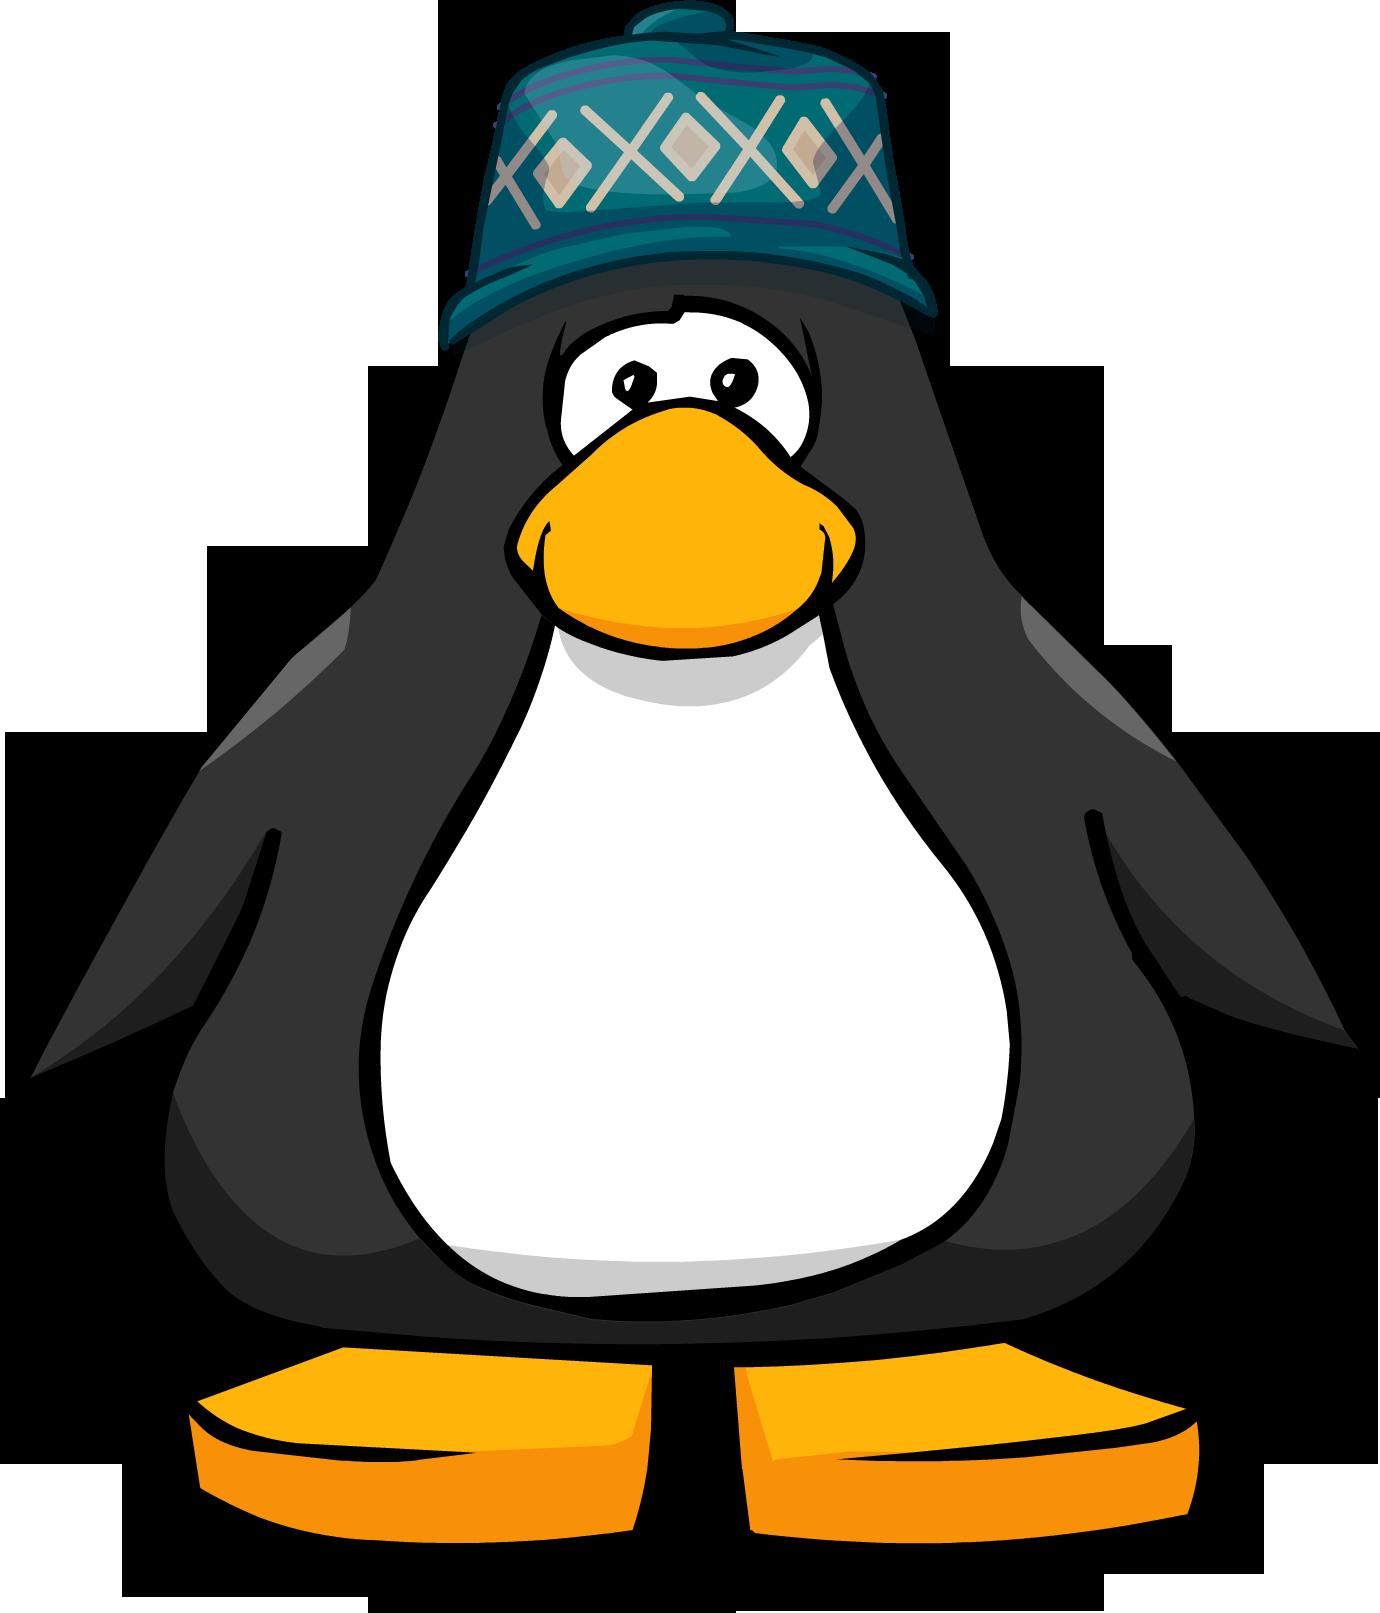 Image hat pc png. Clipart penguin rustic